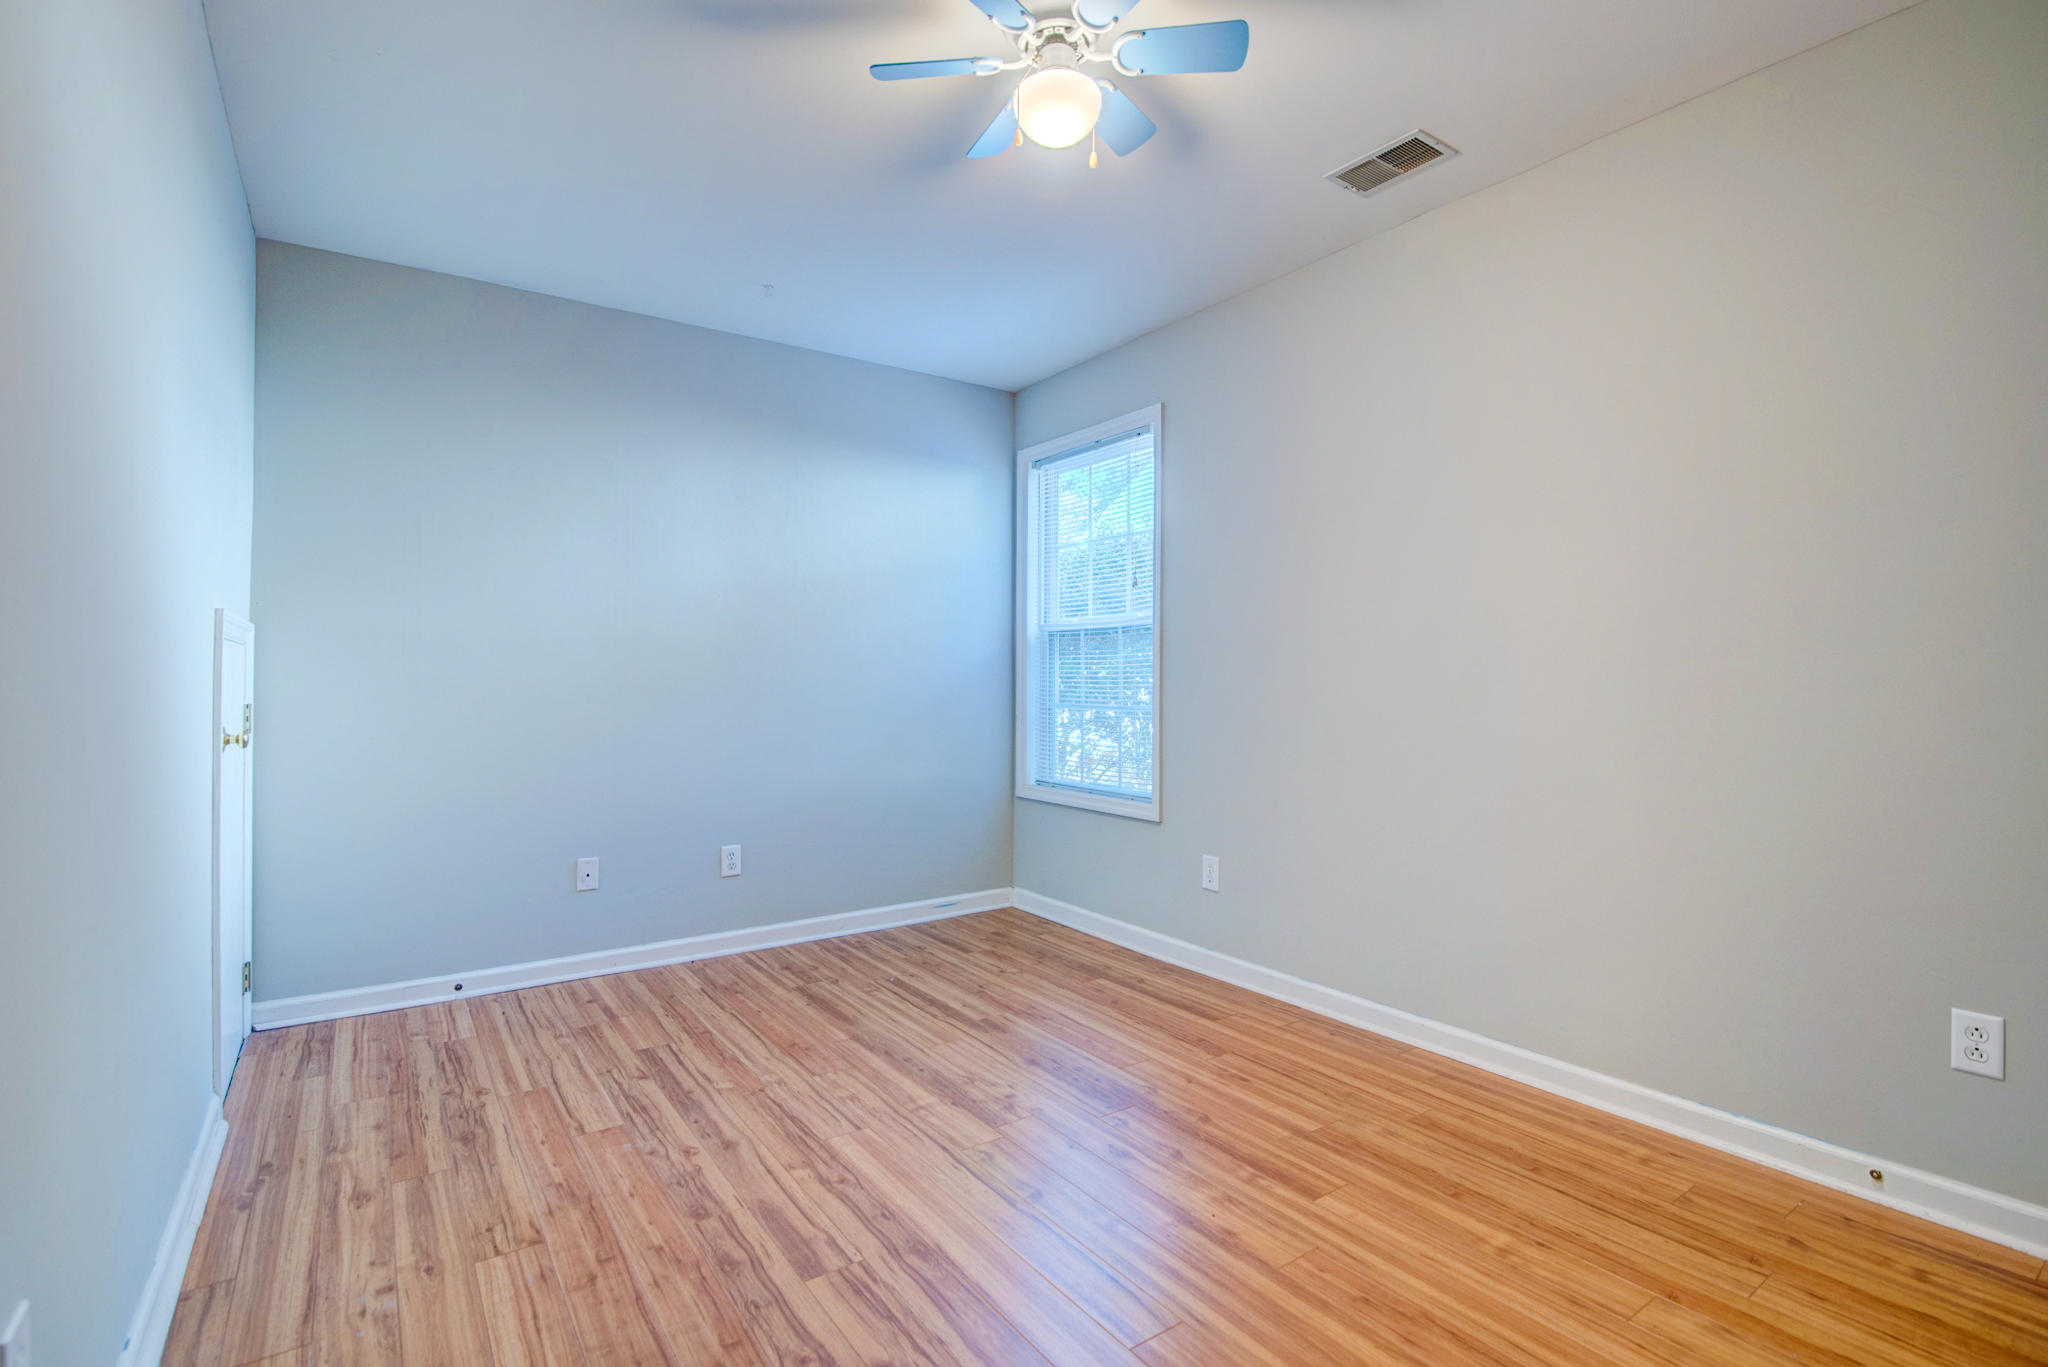 Planters Pointe Homes For Sale - 3382 Lindner, Mount Pleasant, SC - 9